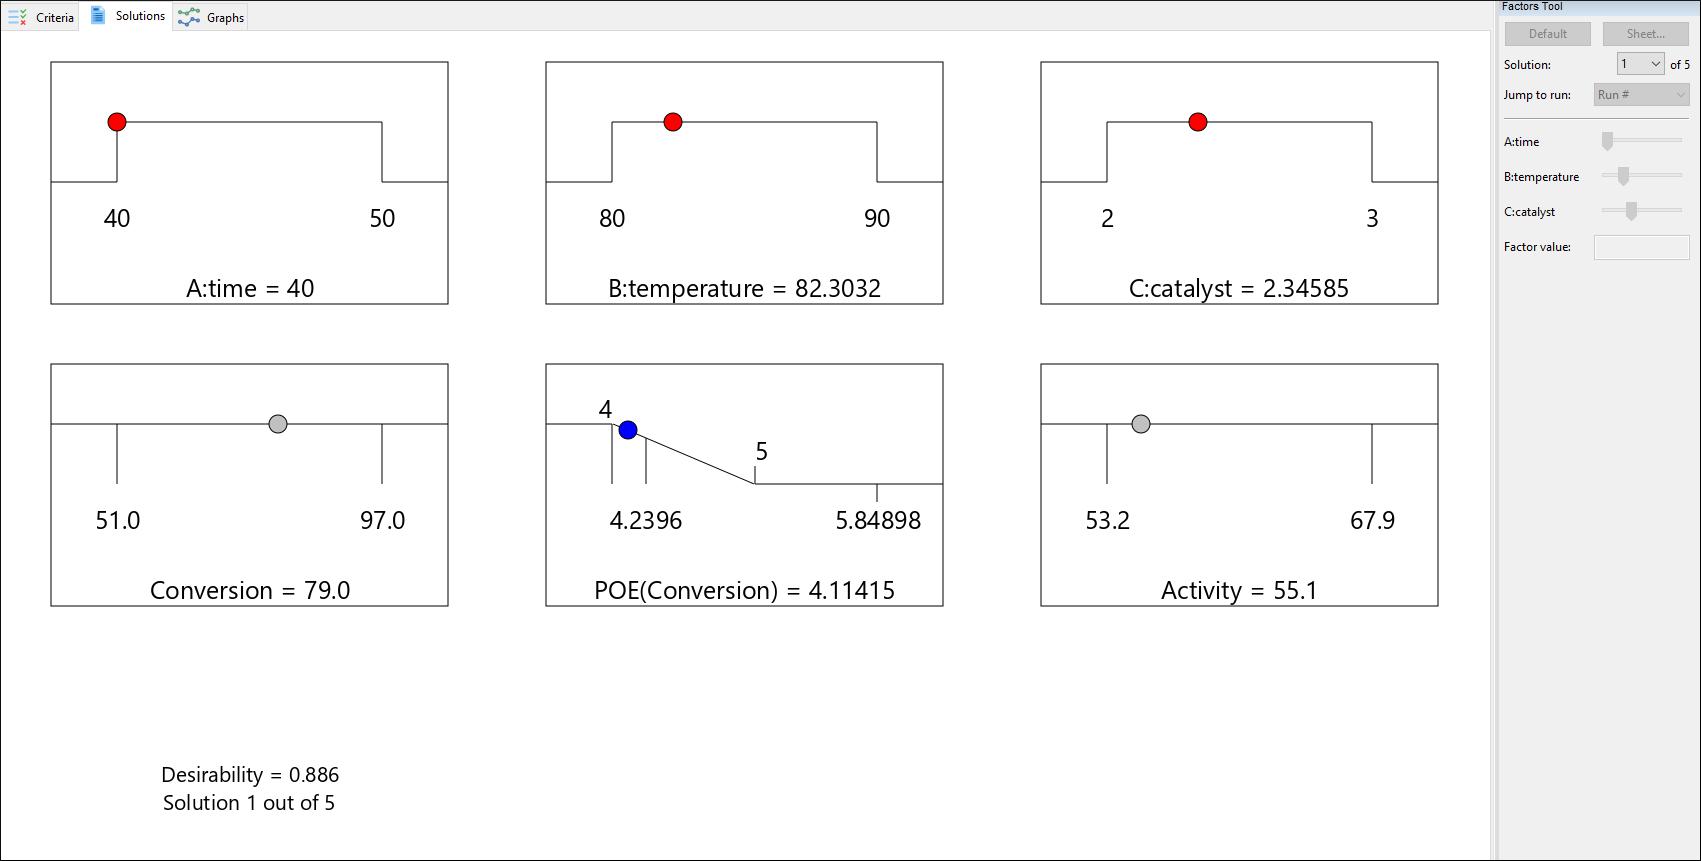 ../../_images/multifactor-rsm-3-15.PNG